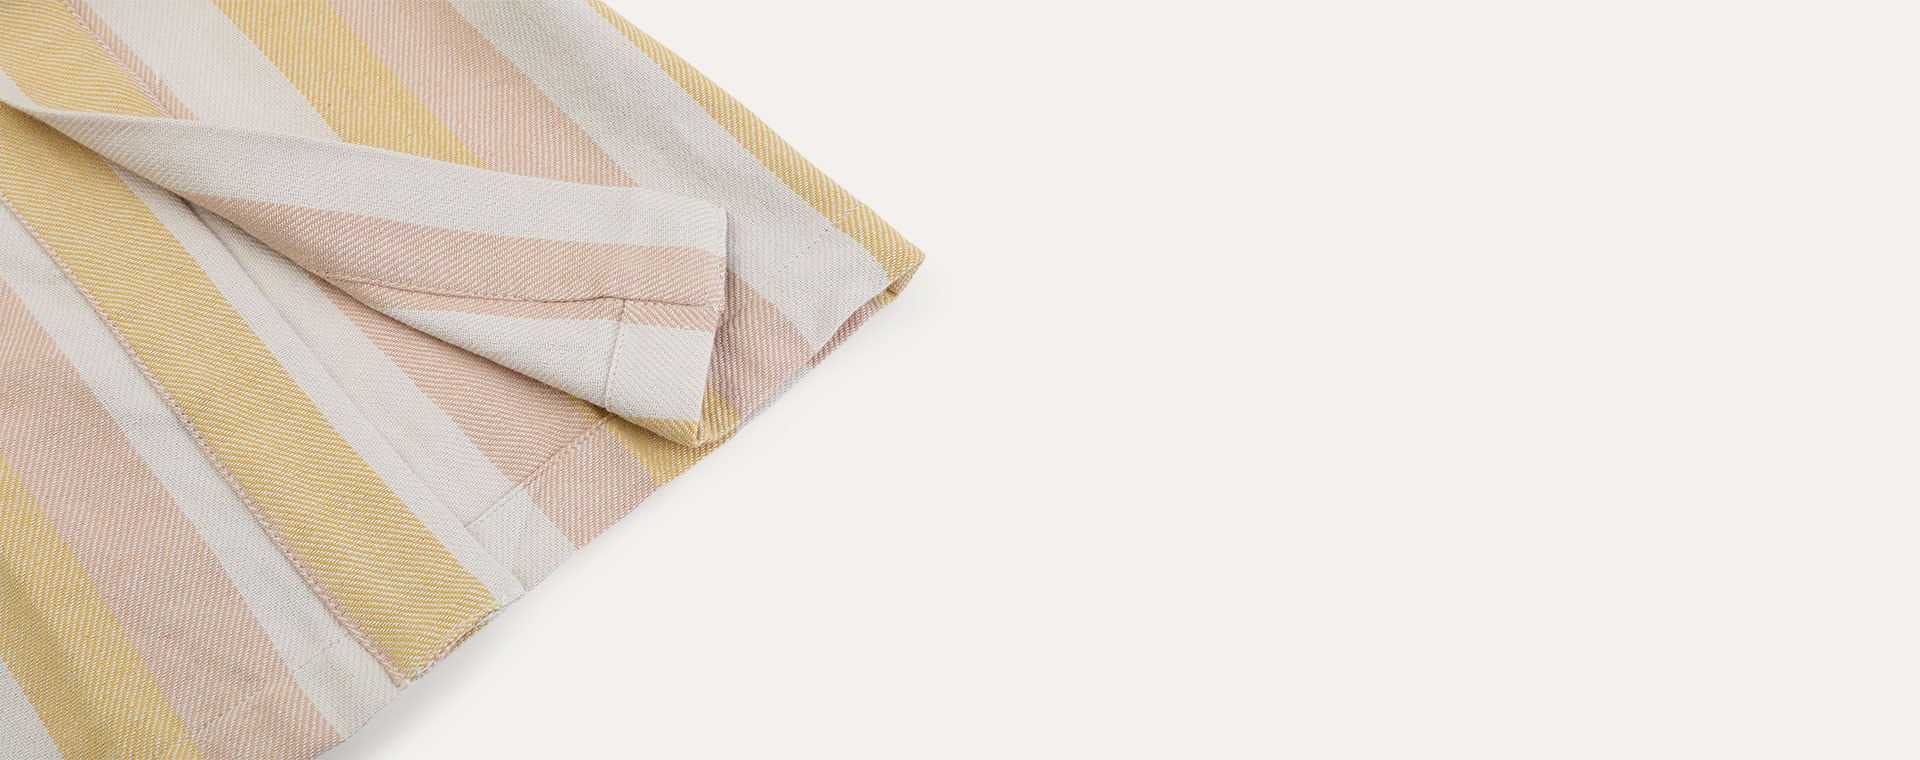 Peach/sandy/yellow mellow Liewood Dana bathrobe